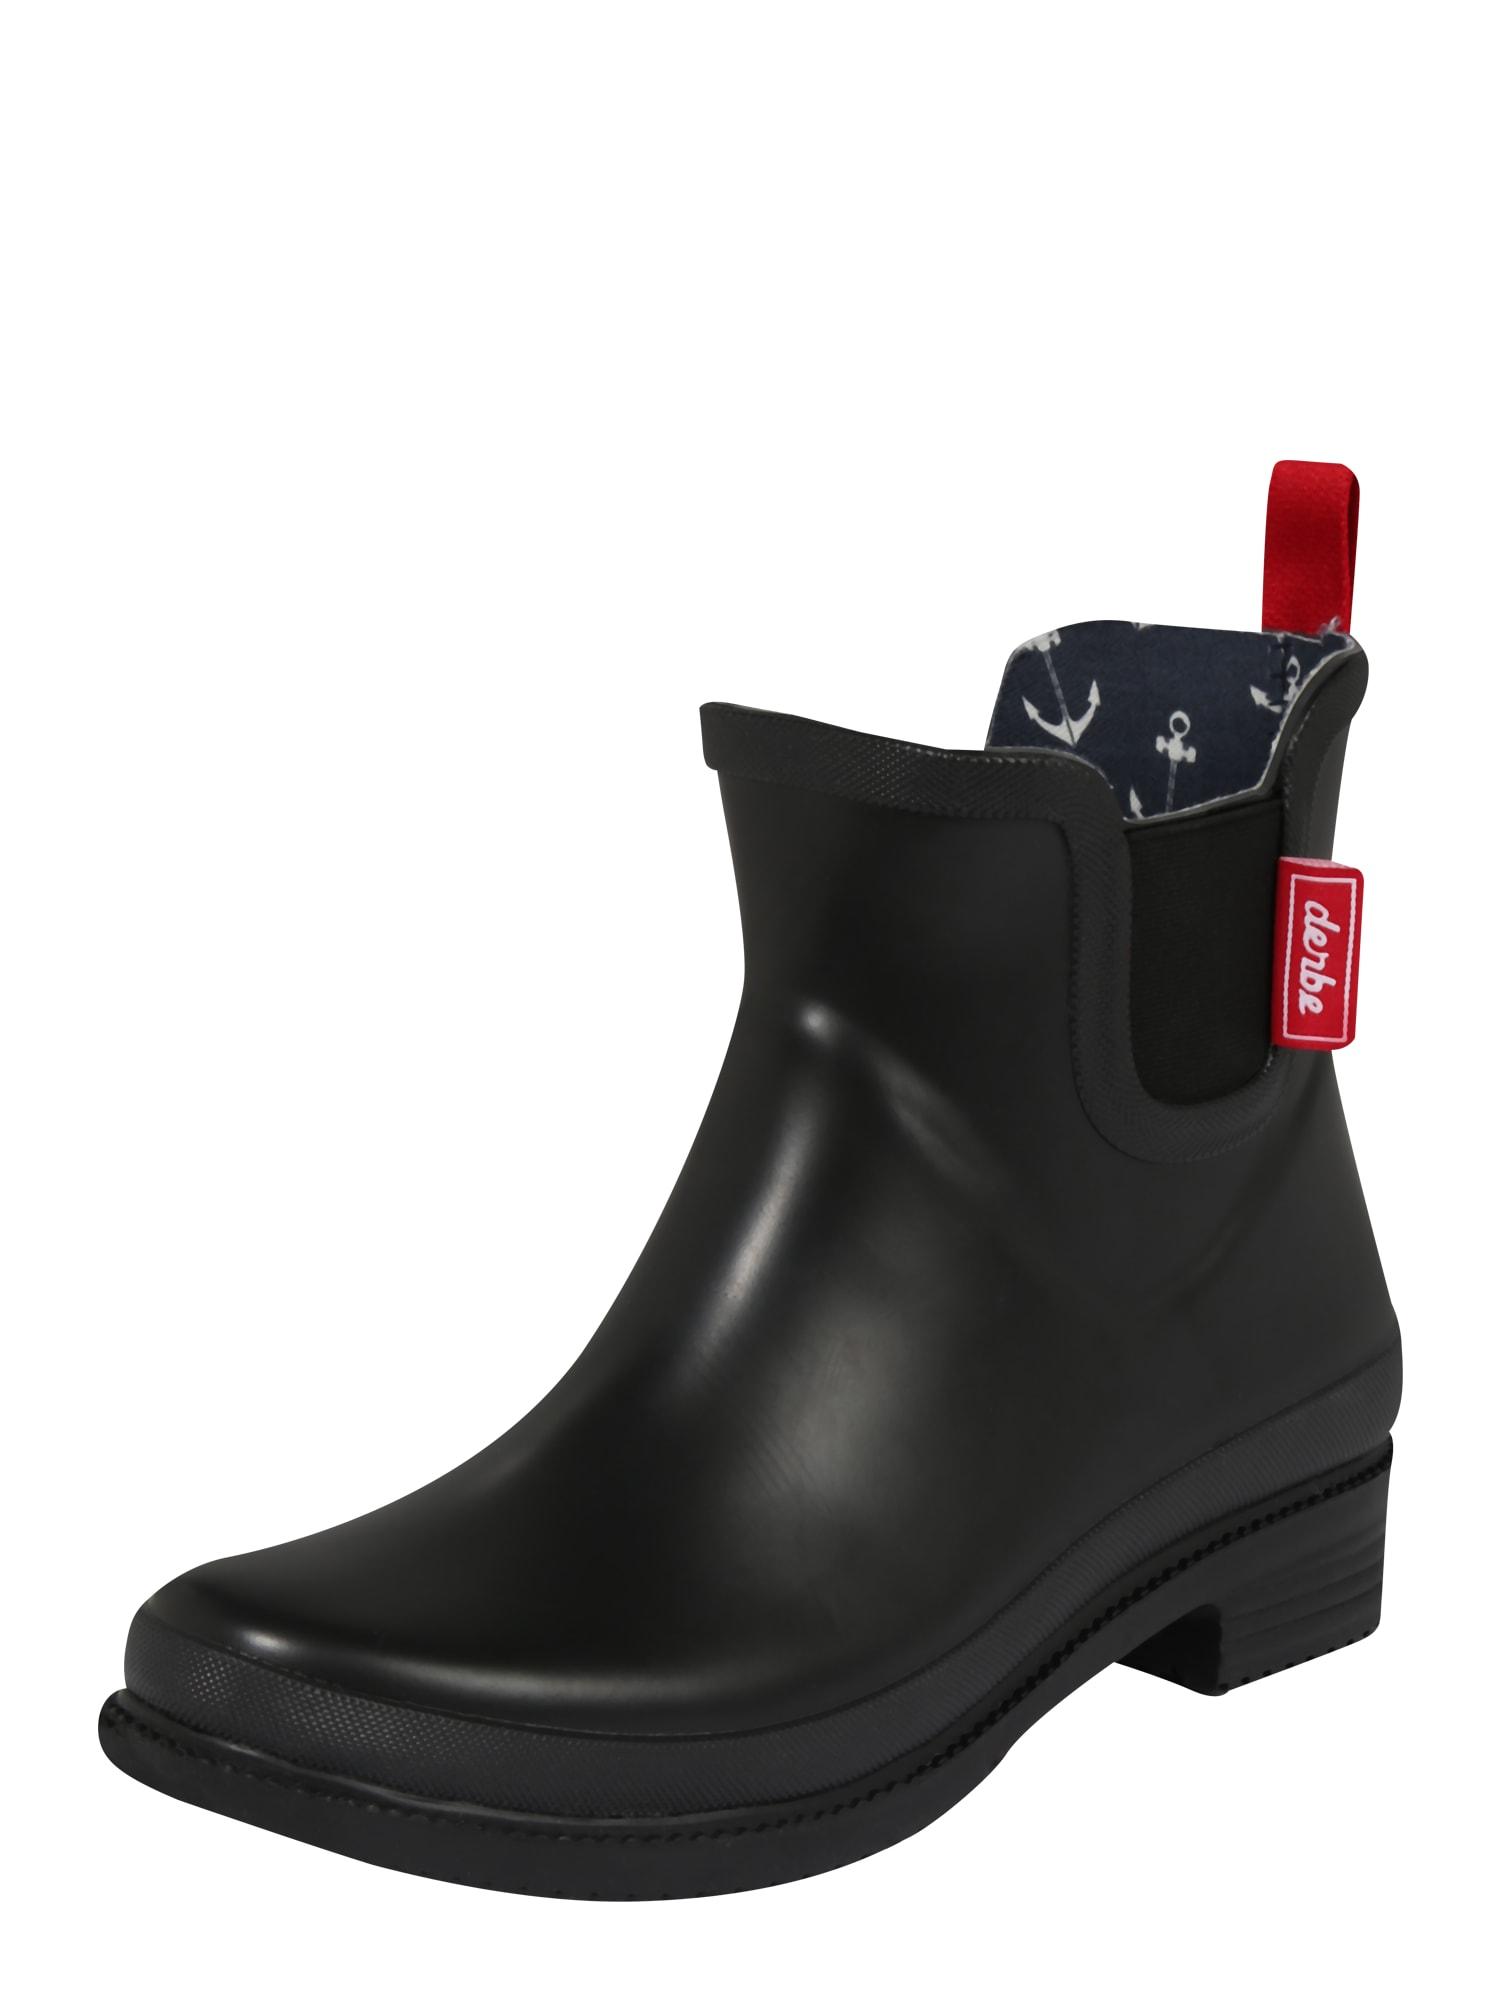 Derbe Guminiai batai 'Taai-Botten' juoda